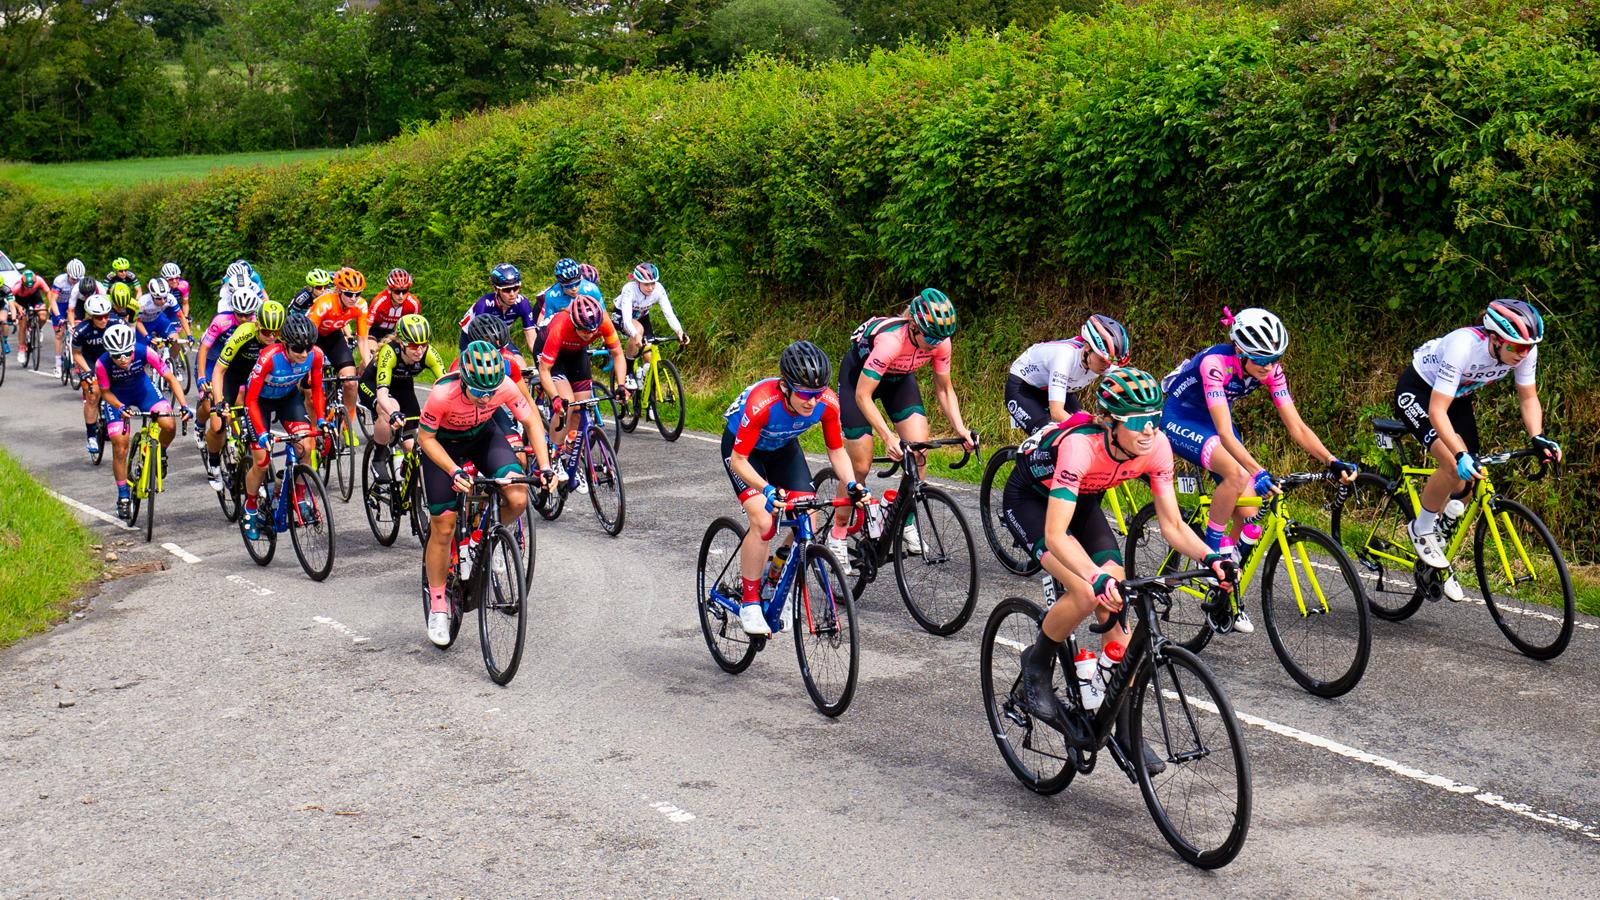 Women's Tour 2021 stage route